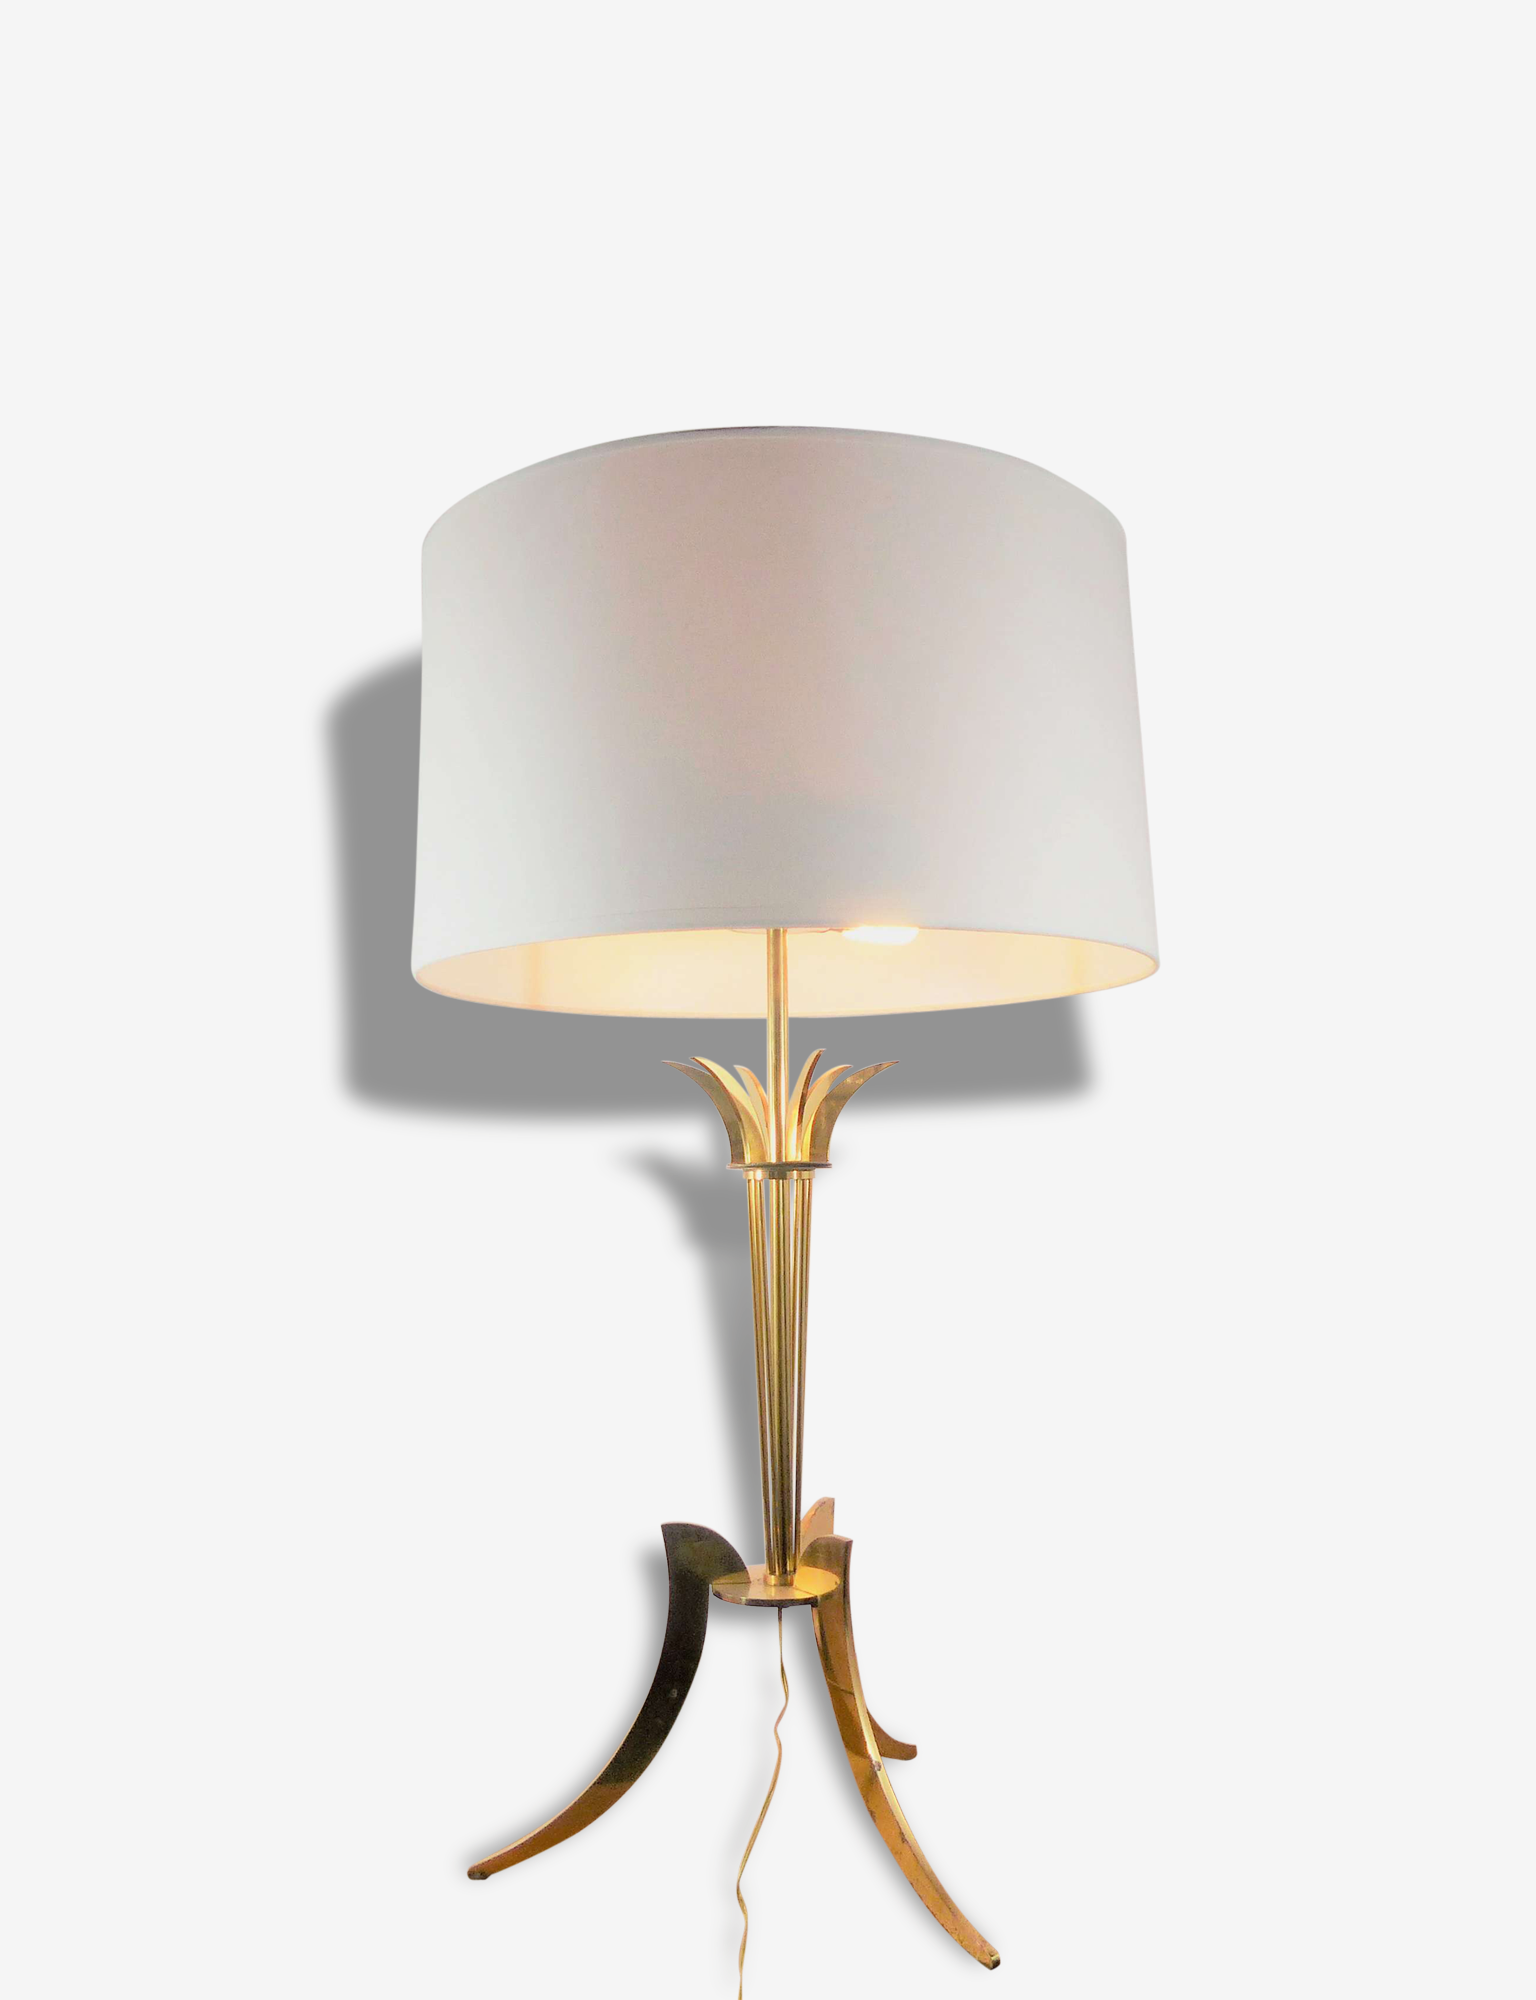 Grande lampe de table tripode en laiton doré 1960